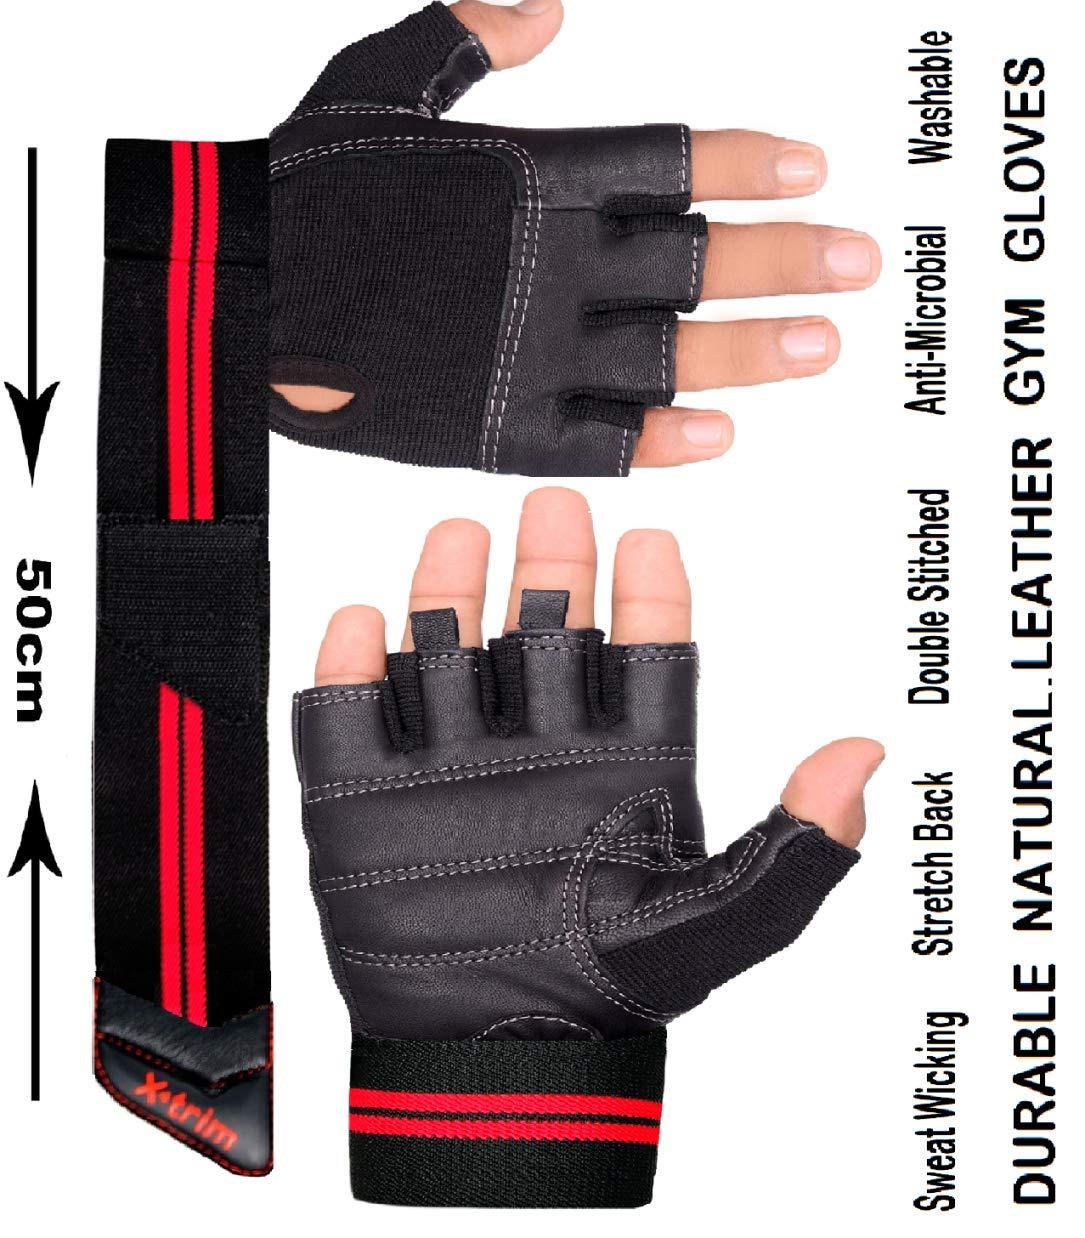 Xtrim Unisex Macho Leather Gym Workout Wrist Wrap Gloves product image